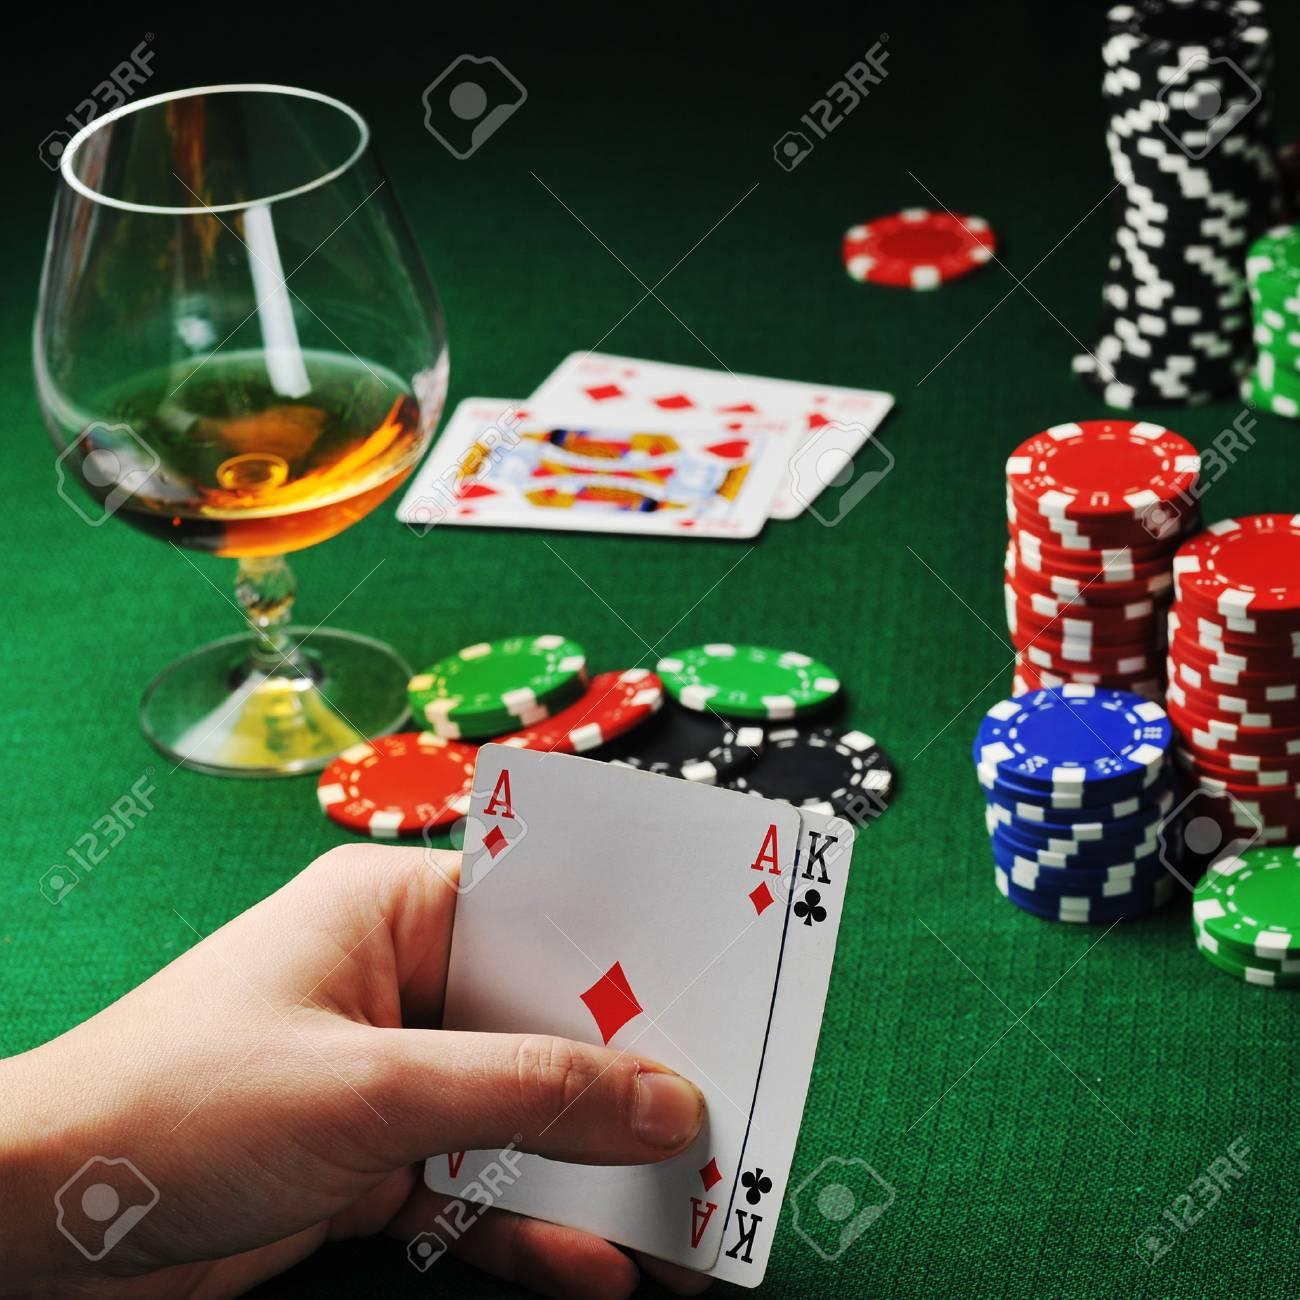 [Image: 30552938-man-sitting-at-the-gambing-tabl...-cards.jpg]